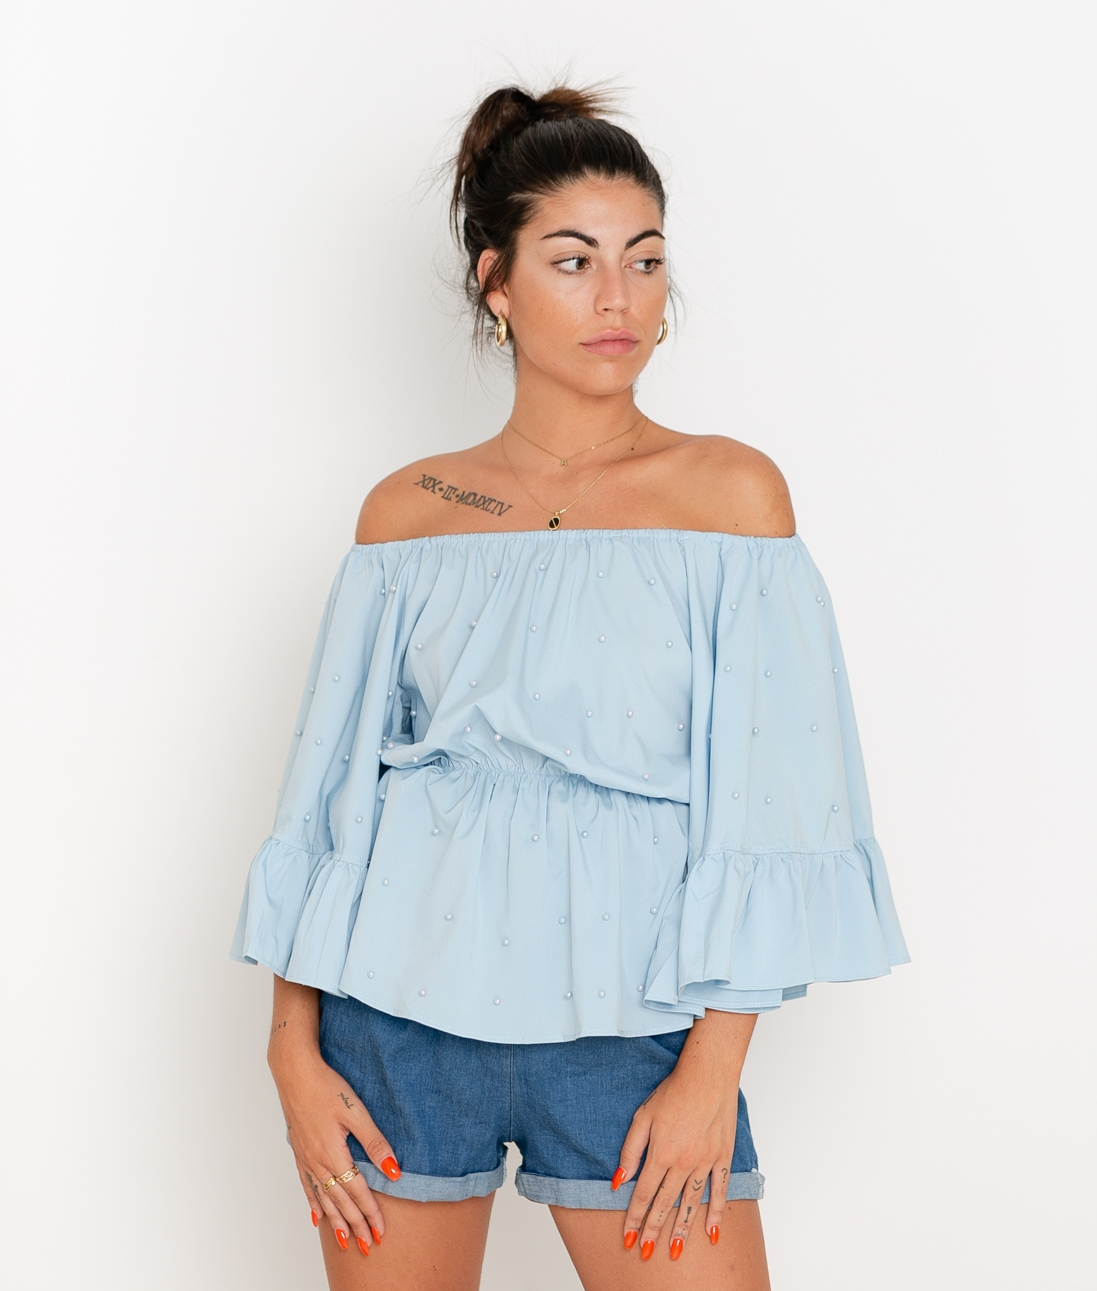 Blusa Perlani - Azul